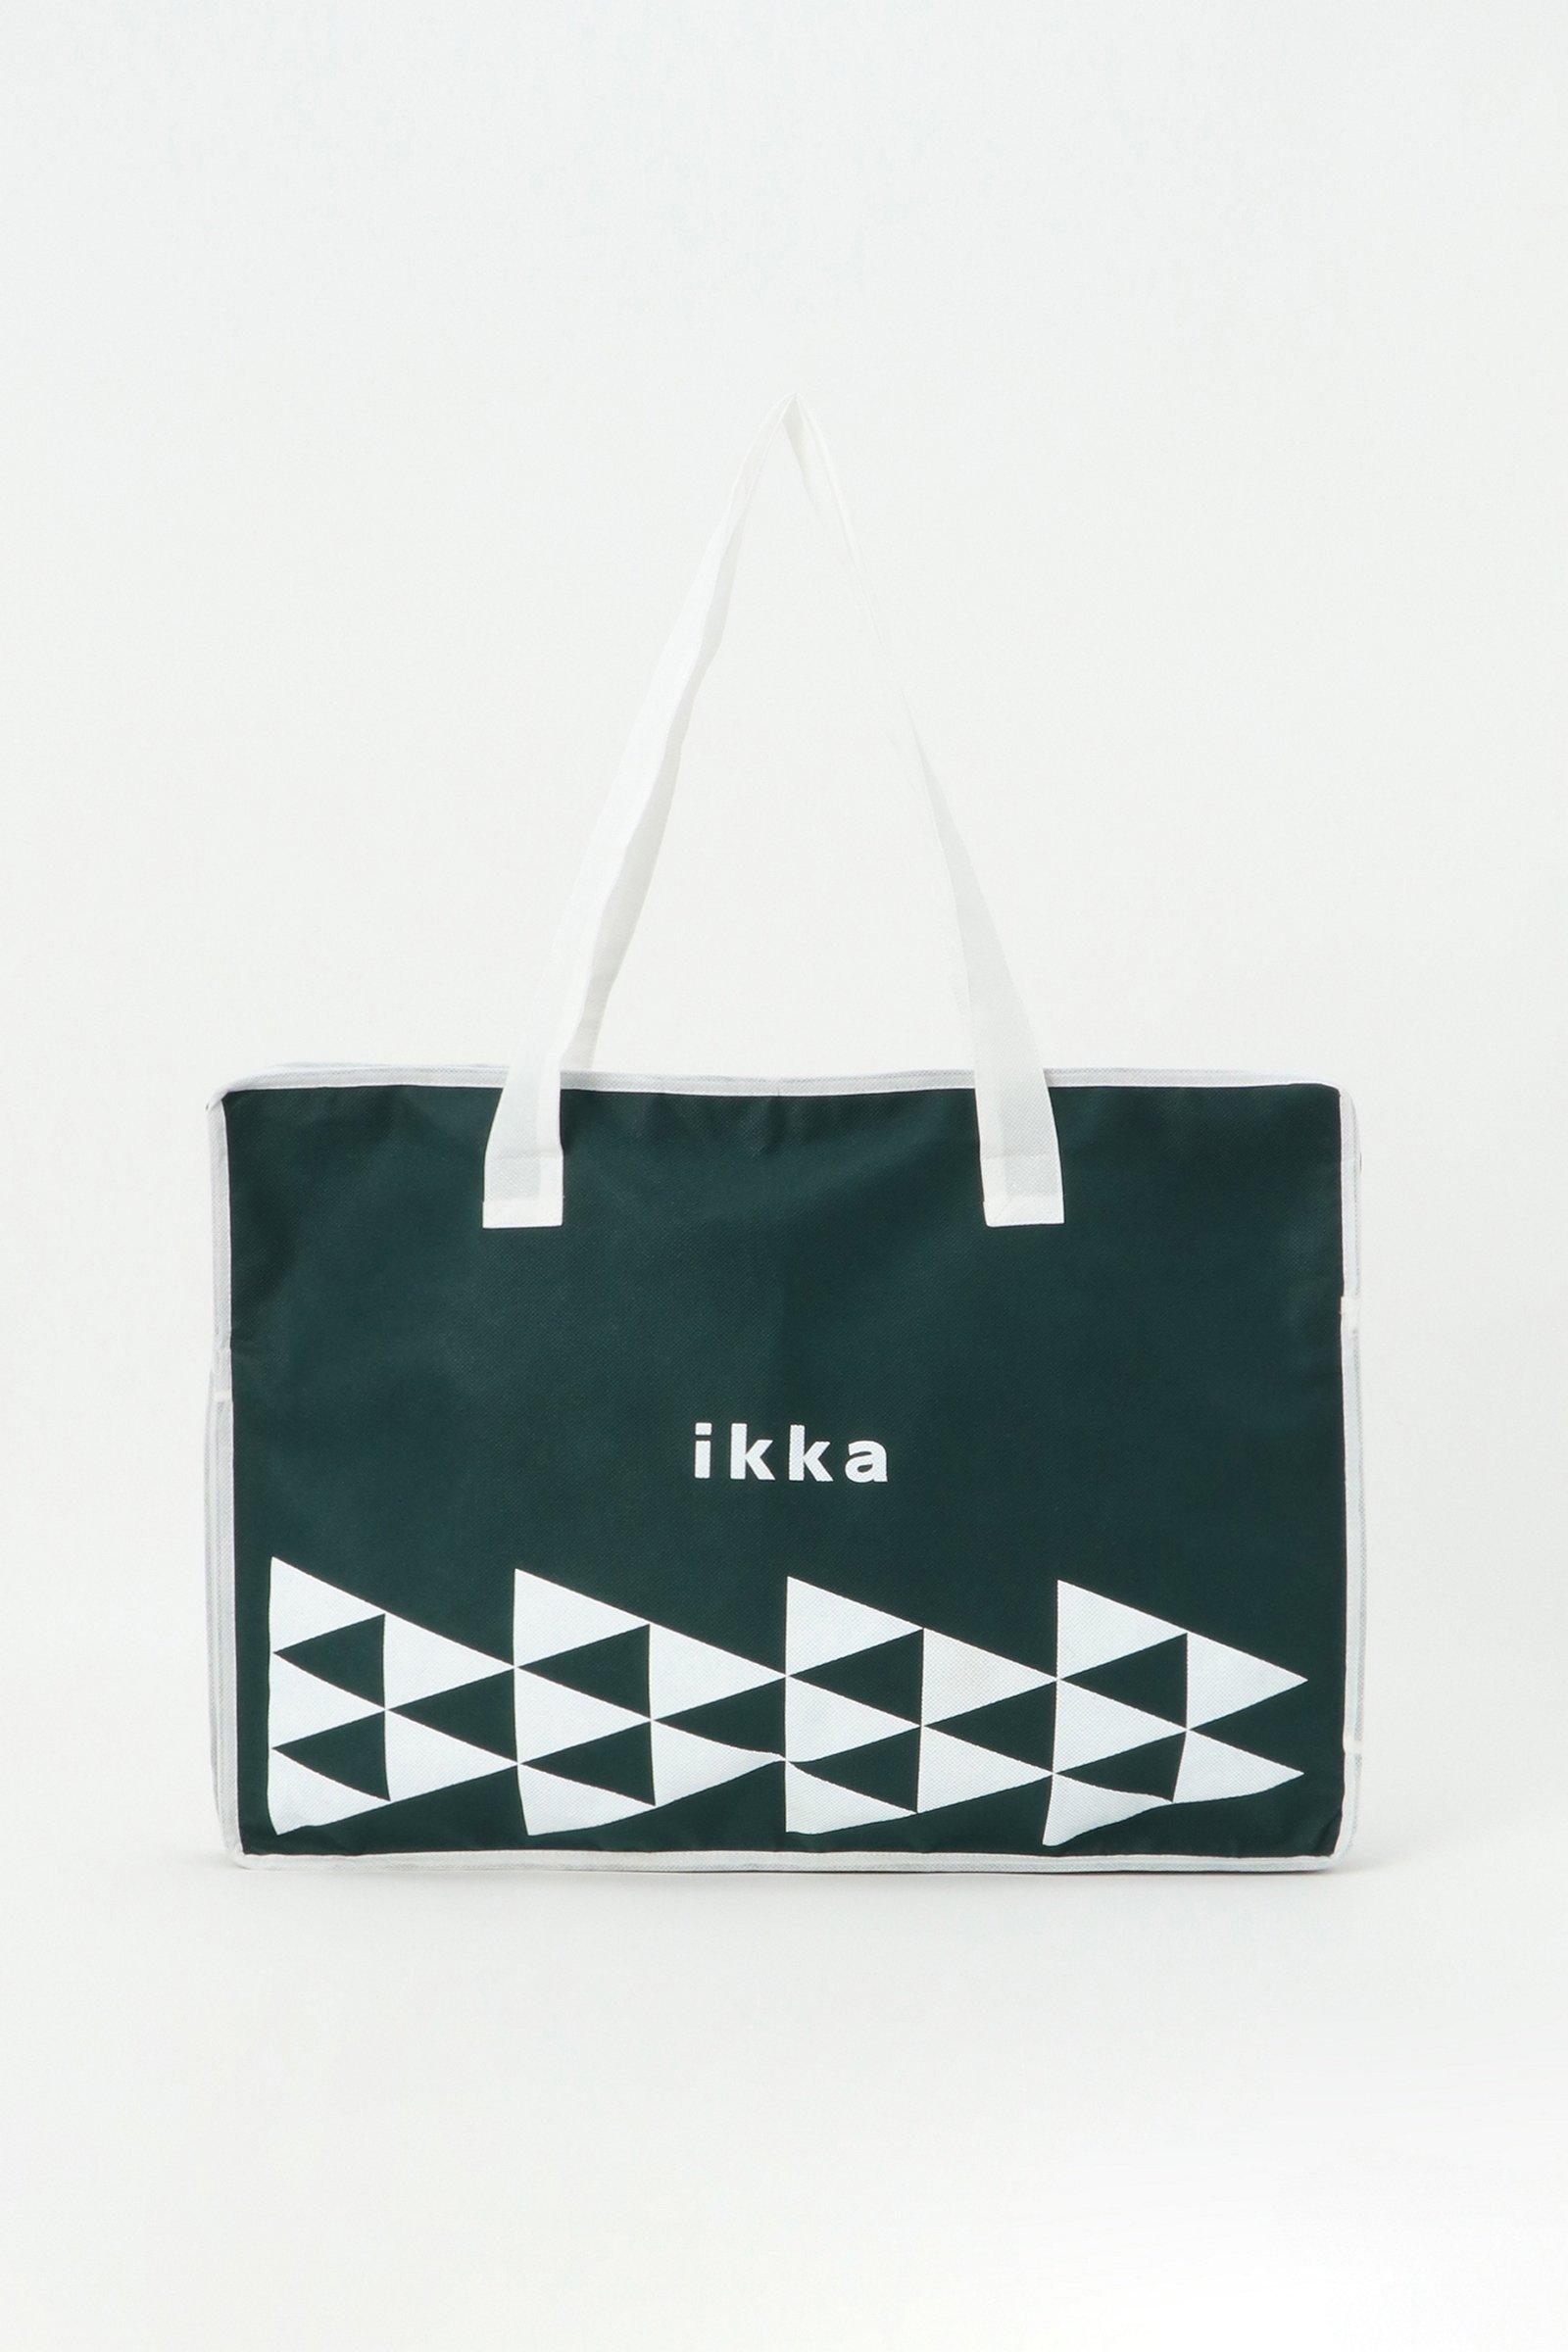 ikka [2018新春福袋] KIDS/BOYS福袋 ikka イッカ【先行予約】*【送料無料】